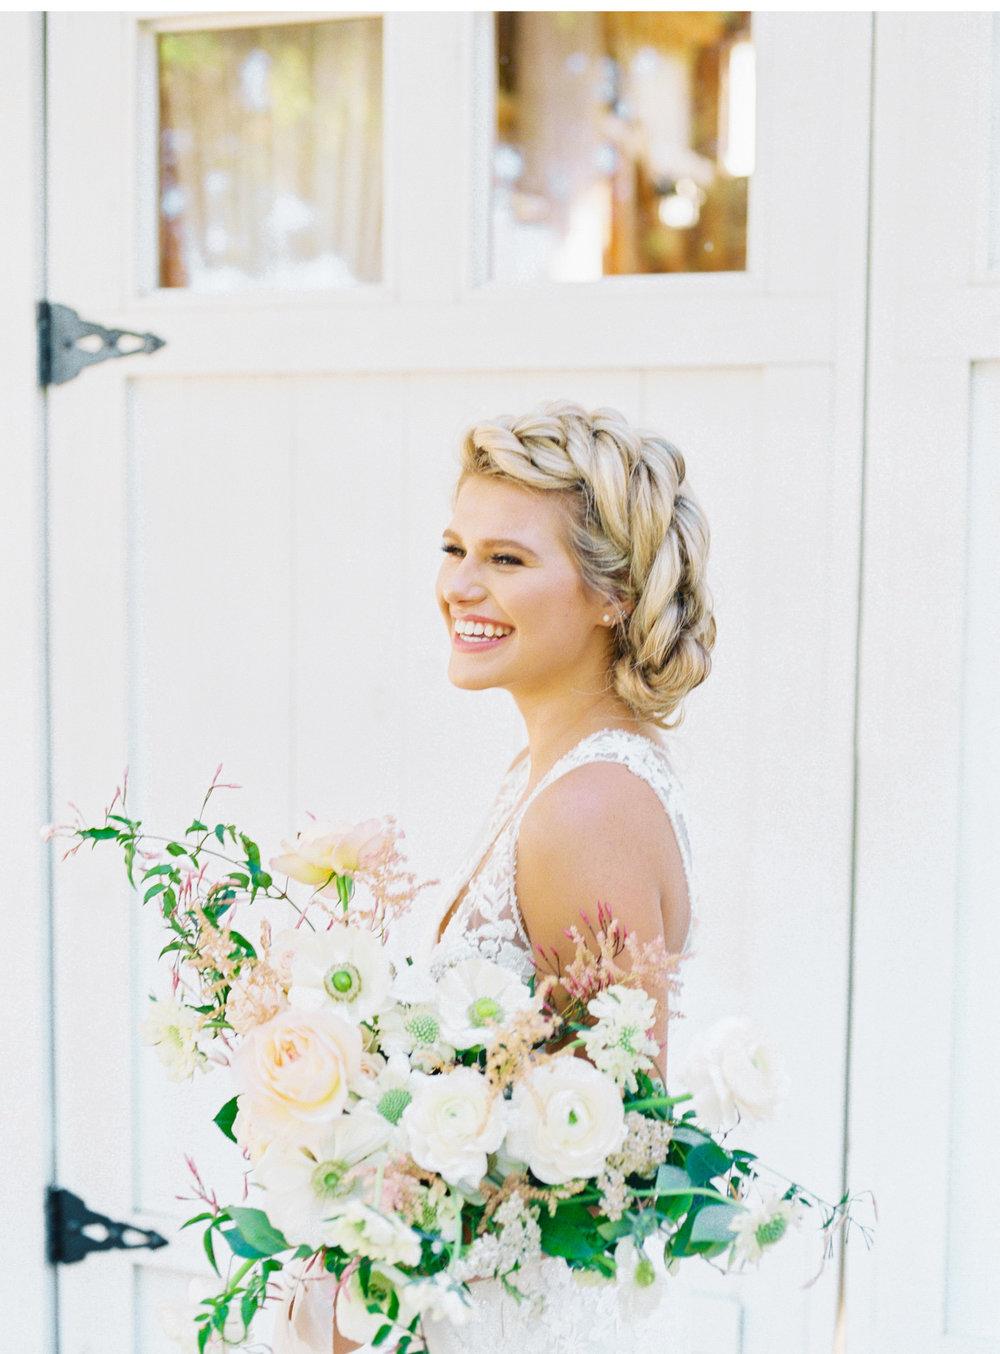 San-Luis-Obispo-Weddings-Natalie-Schutt-Wedding-Photography_11.jpg